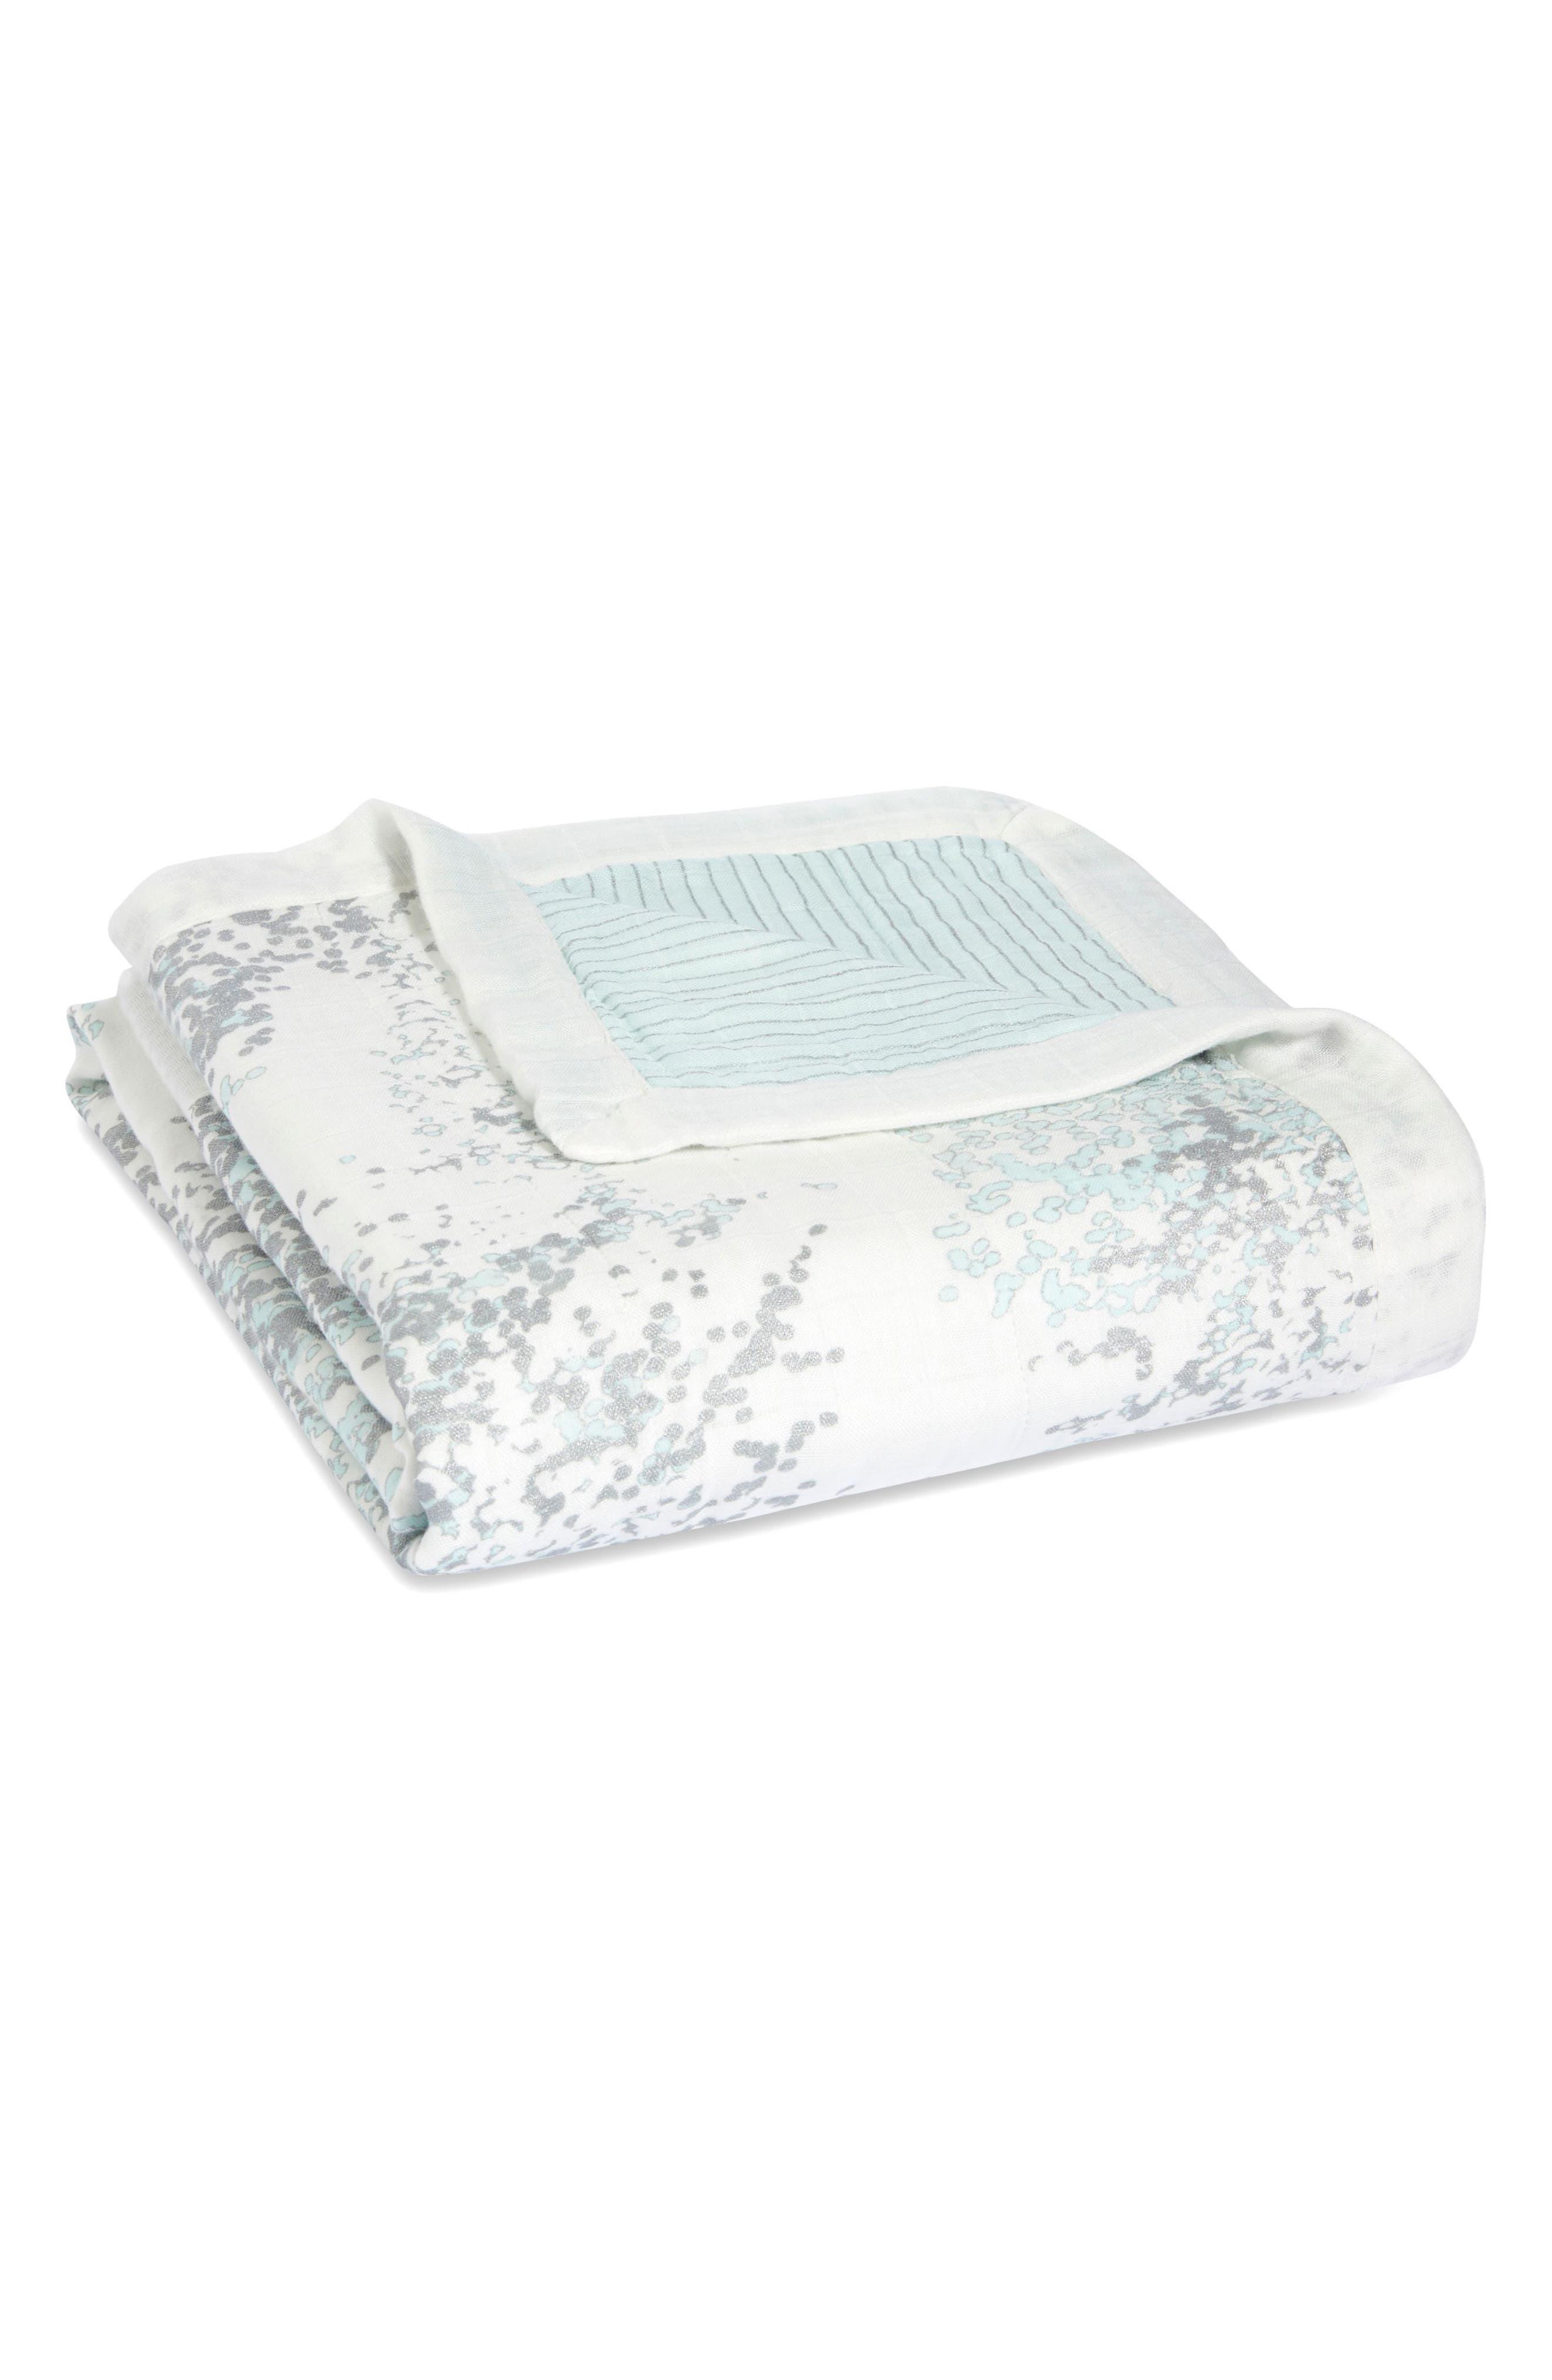 aden + anais Silky Soft Dream Blanket™